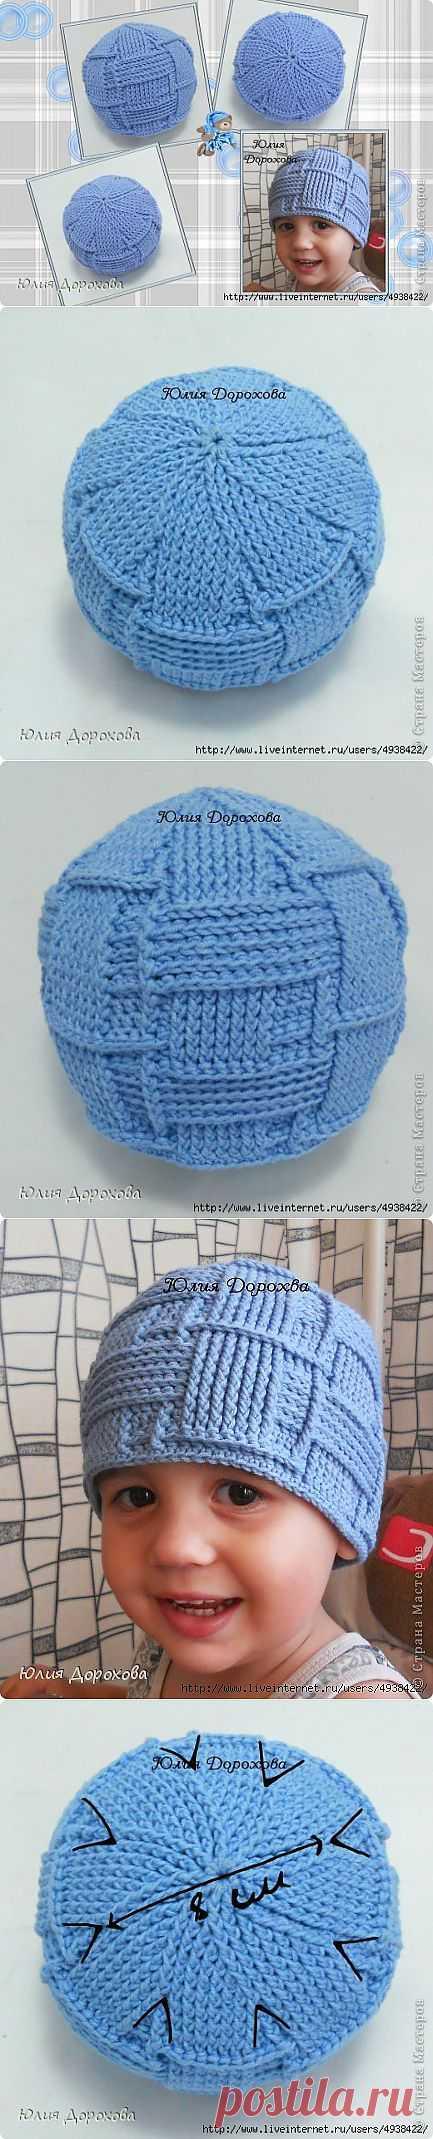 цитата TravVera : Шапка для сынули.МК. (11:54 14-09-2013) [5062860/291201827] - valentina.fedcko@mail.ru - Почта Mail.Ru